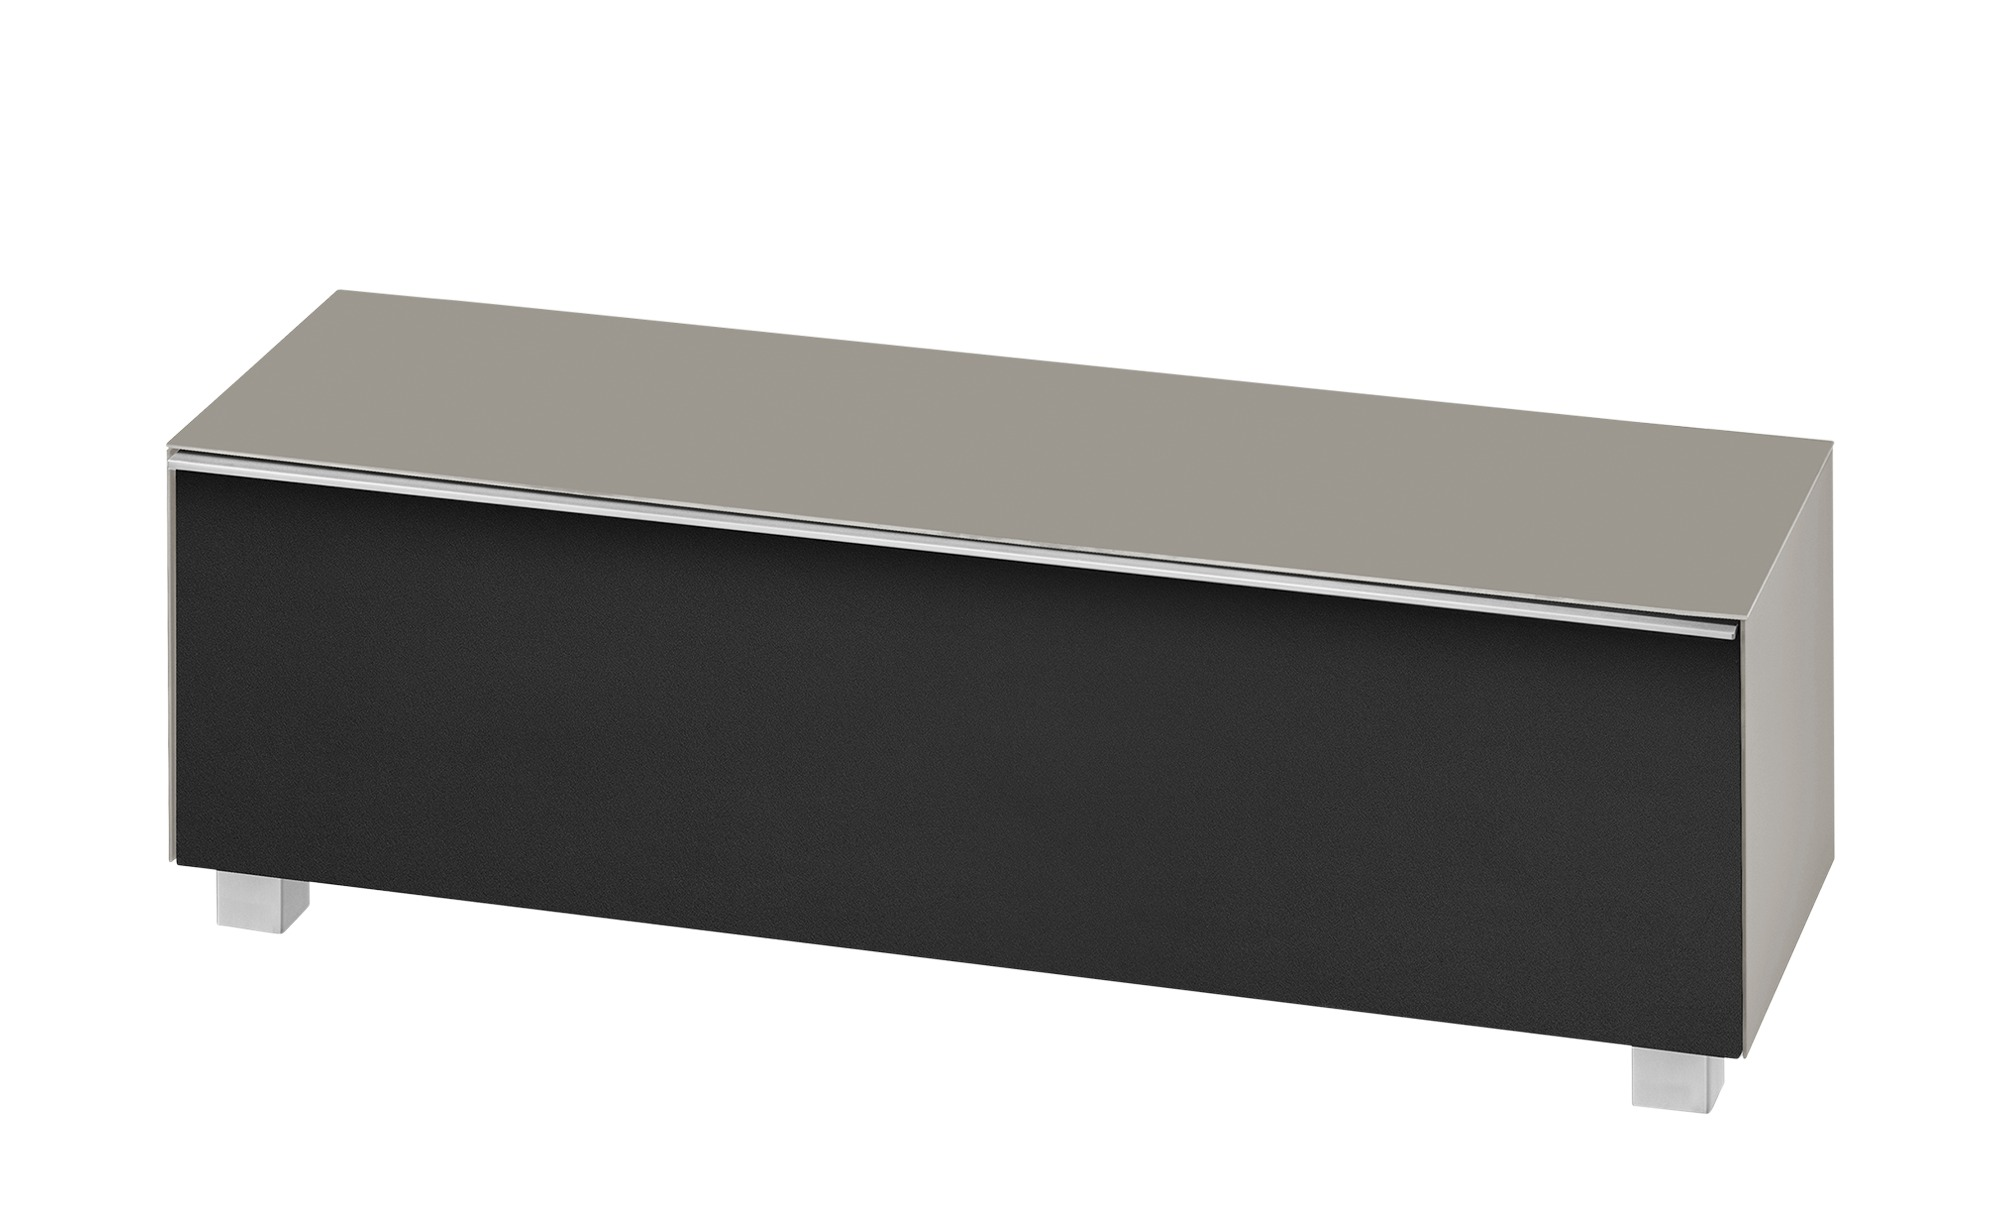 Lowboard  Soundbase L ¦ braun ¦ Maße (cm): B: 180 H: 43 T: 42 Kommoden & Sideboards > Lowboards - Höffner